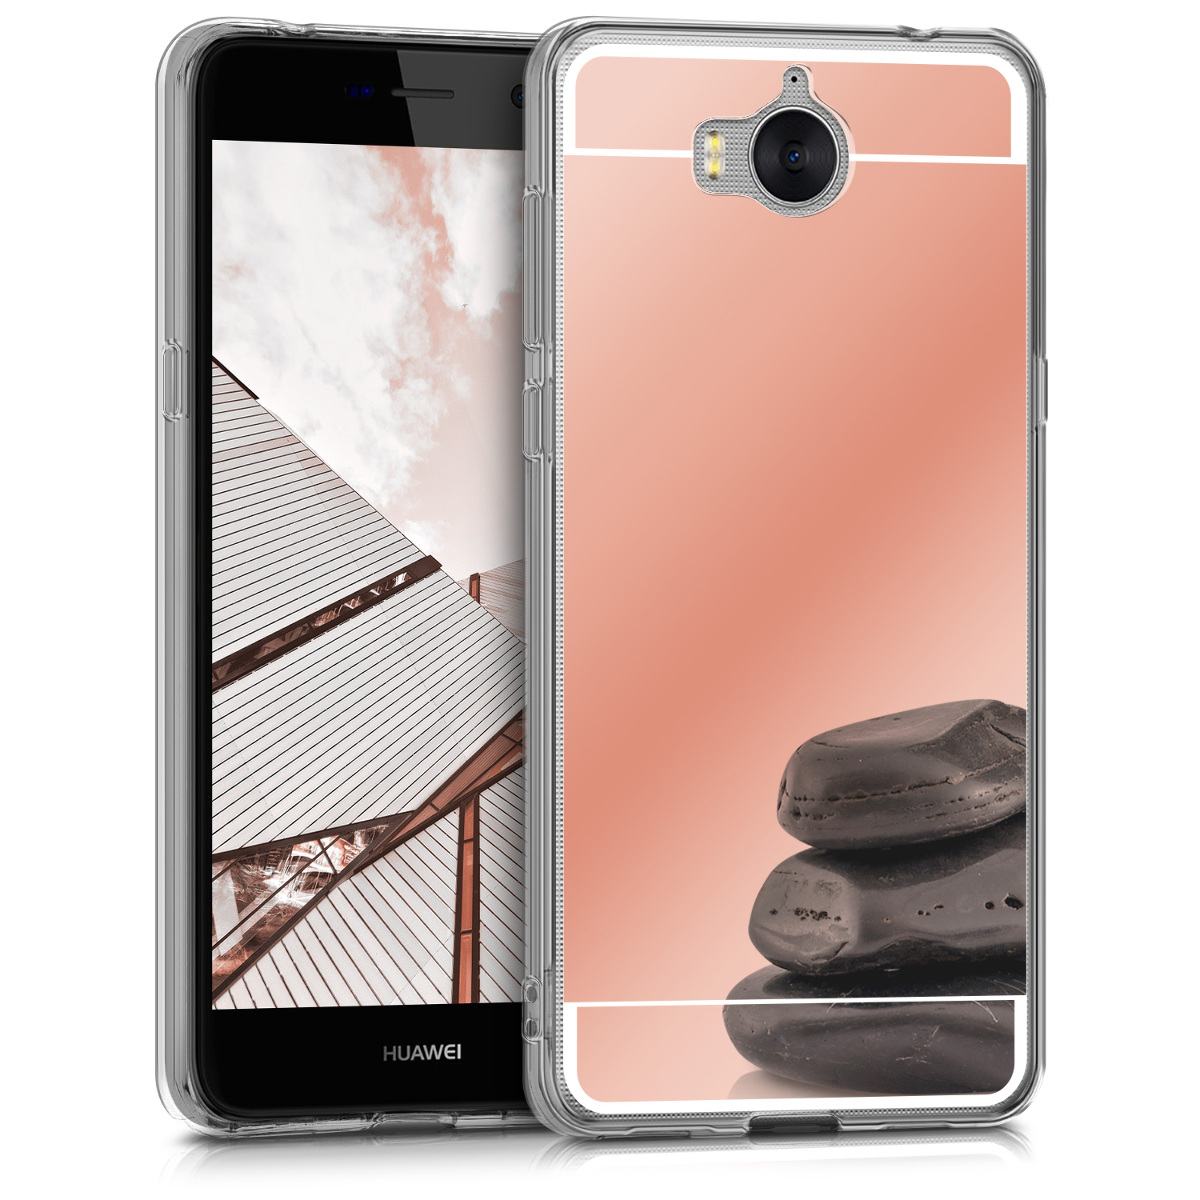 Kwmobile housse miroir pour huawei y6 2017 tui portable for Housse huawei y6 2017